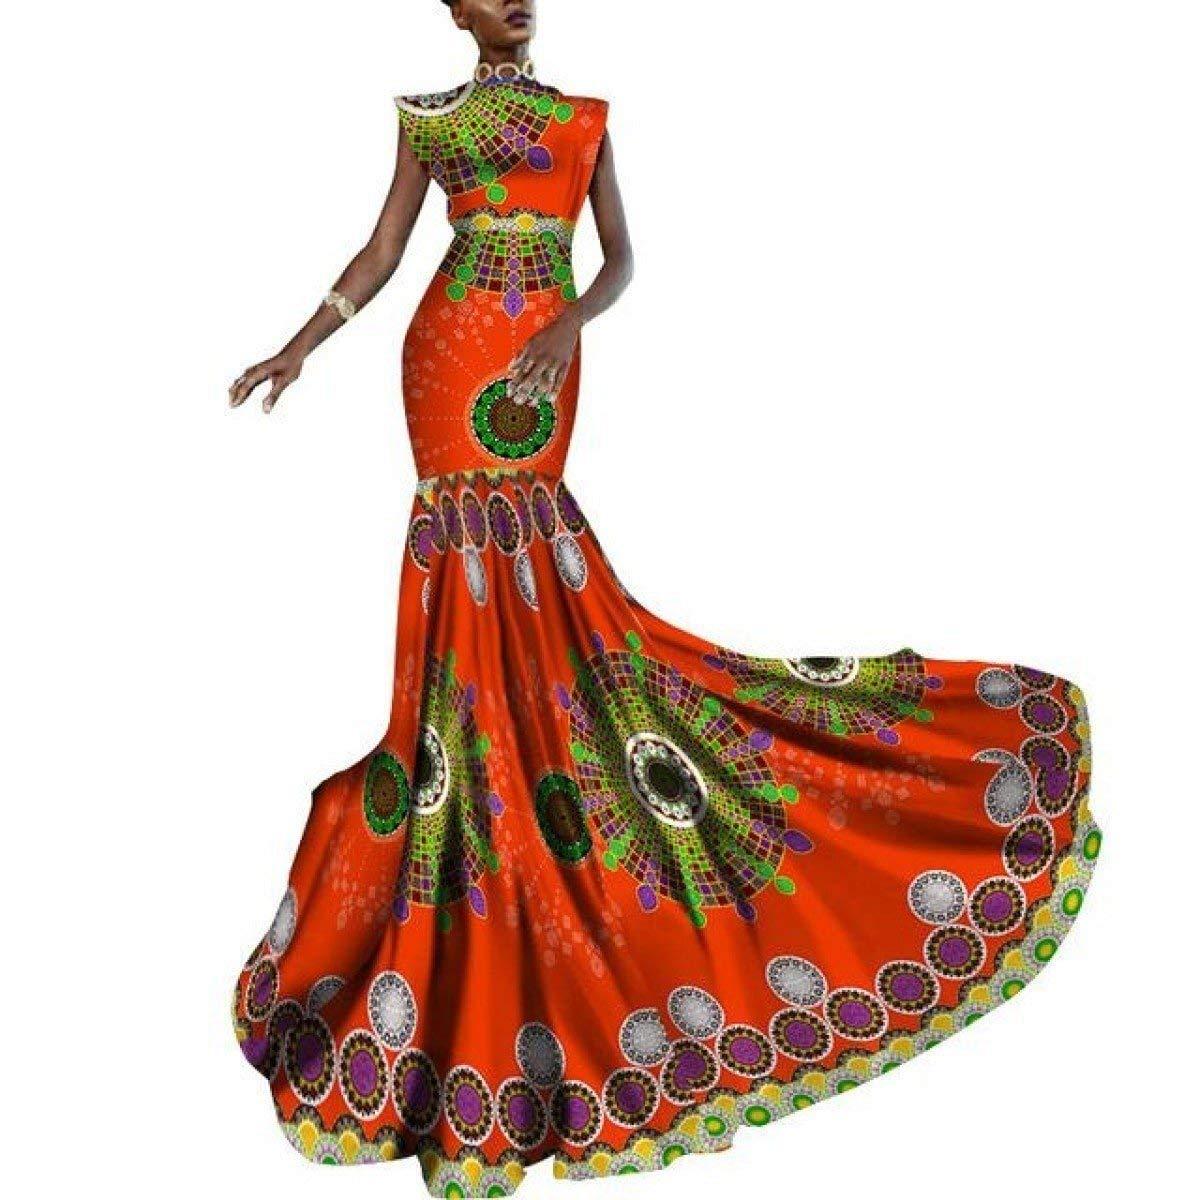 c1e577599 Amazon.com: African Women Dashiki Print Clothing Sleeveless Ankara Mermaid  Party Long X11434: Clothing